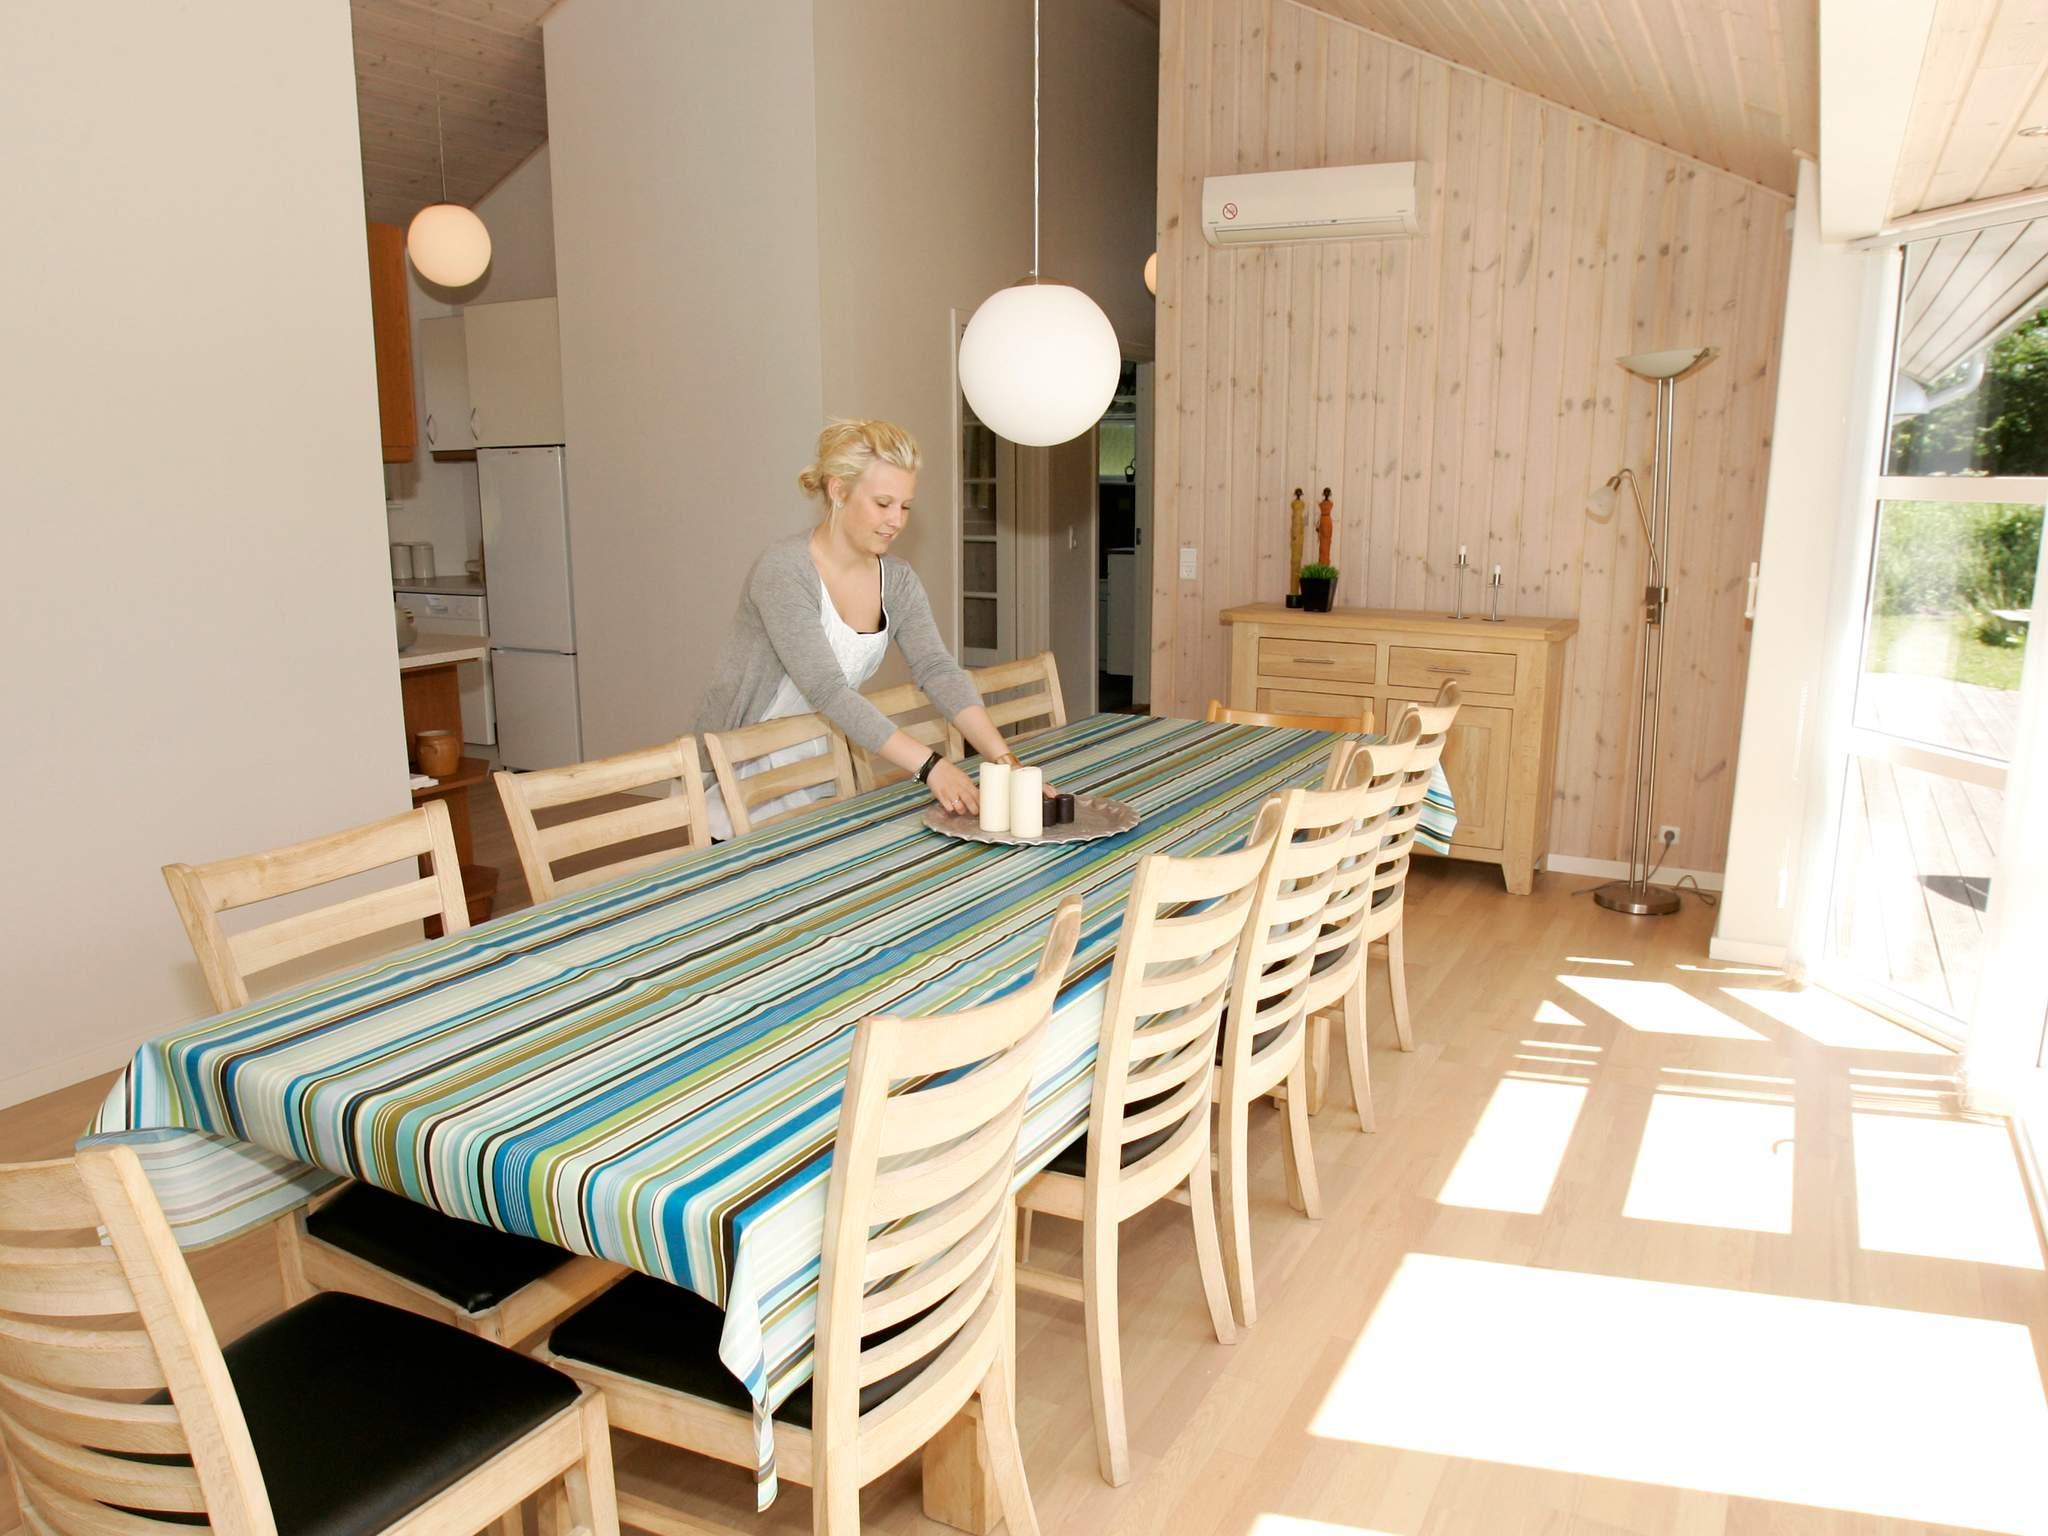 Ferienhaus Øster Hurup (487406), Øster Hurup, , Ostjütland, Dänemark, Bild 3